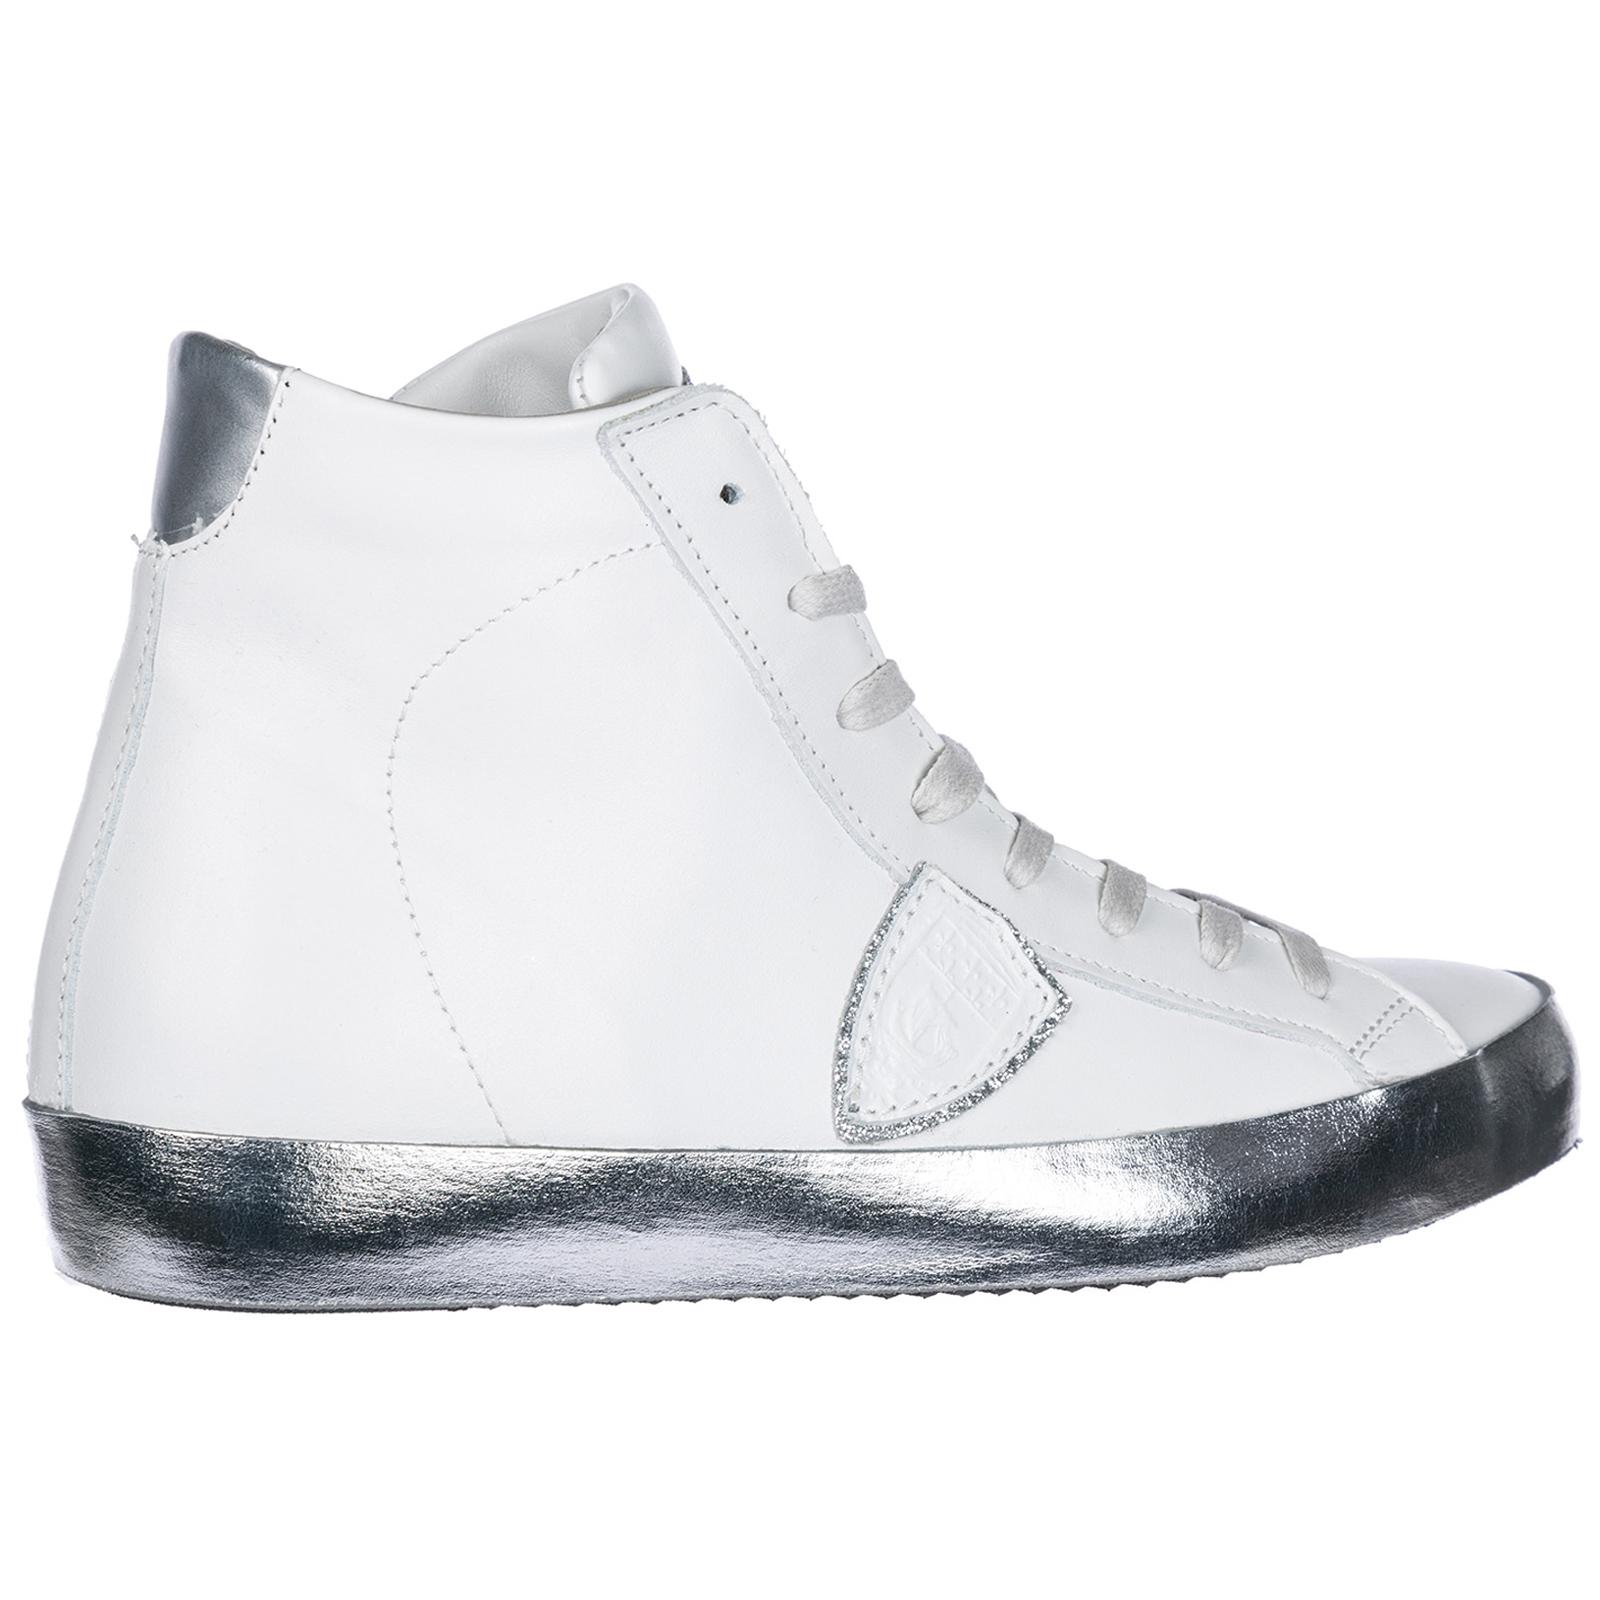 argent Philippe VL10 alte A17ICEHD Paris Model blanc Sneakers HwBqzAnR